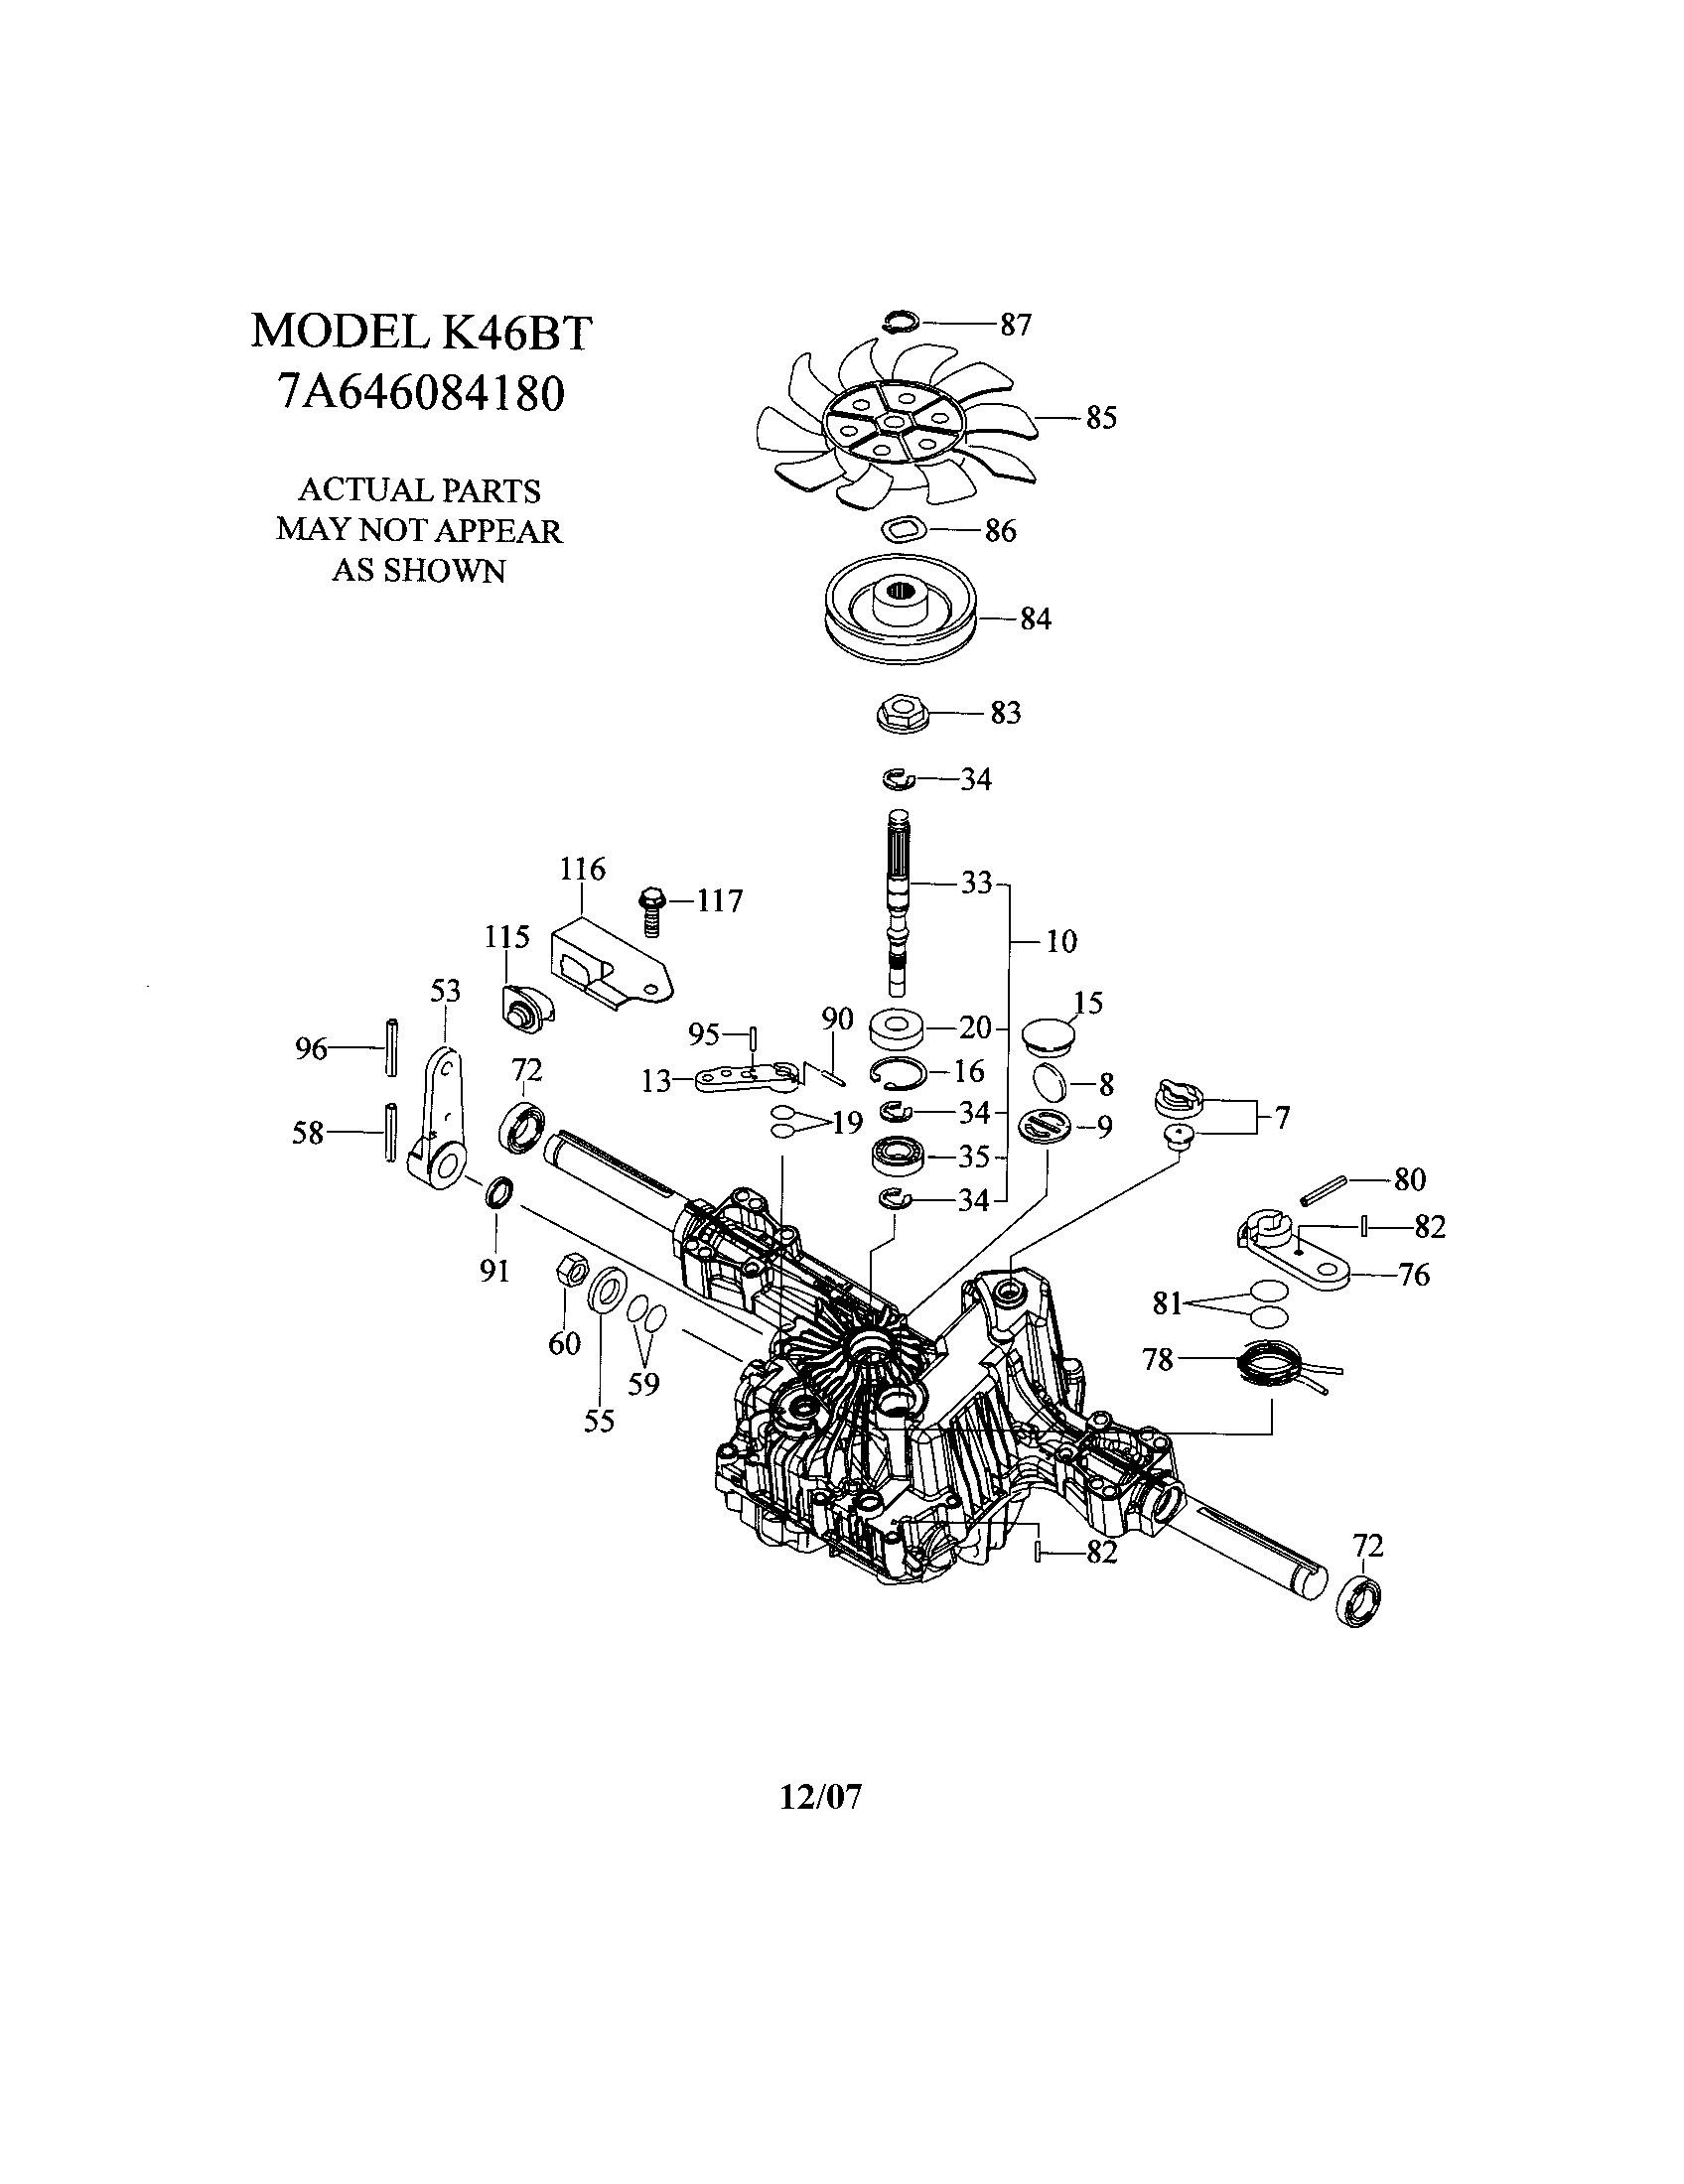 Dixon Lawn Mower Parts Diagram 917 Craftsman 26 Hp 54 Inch Automatic Lawn Tractor Manual Of Dixon Lawn Mower Parts Diagram